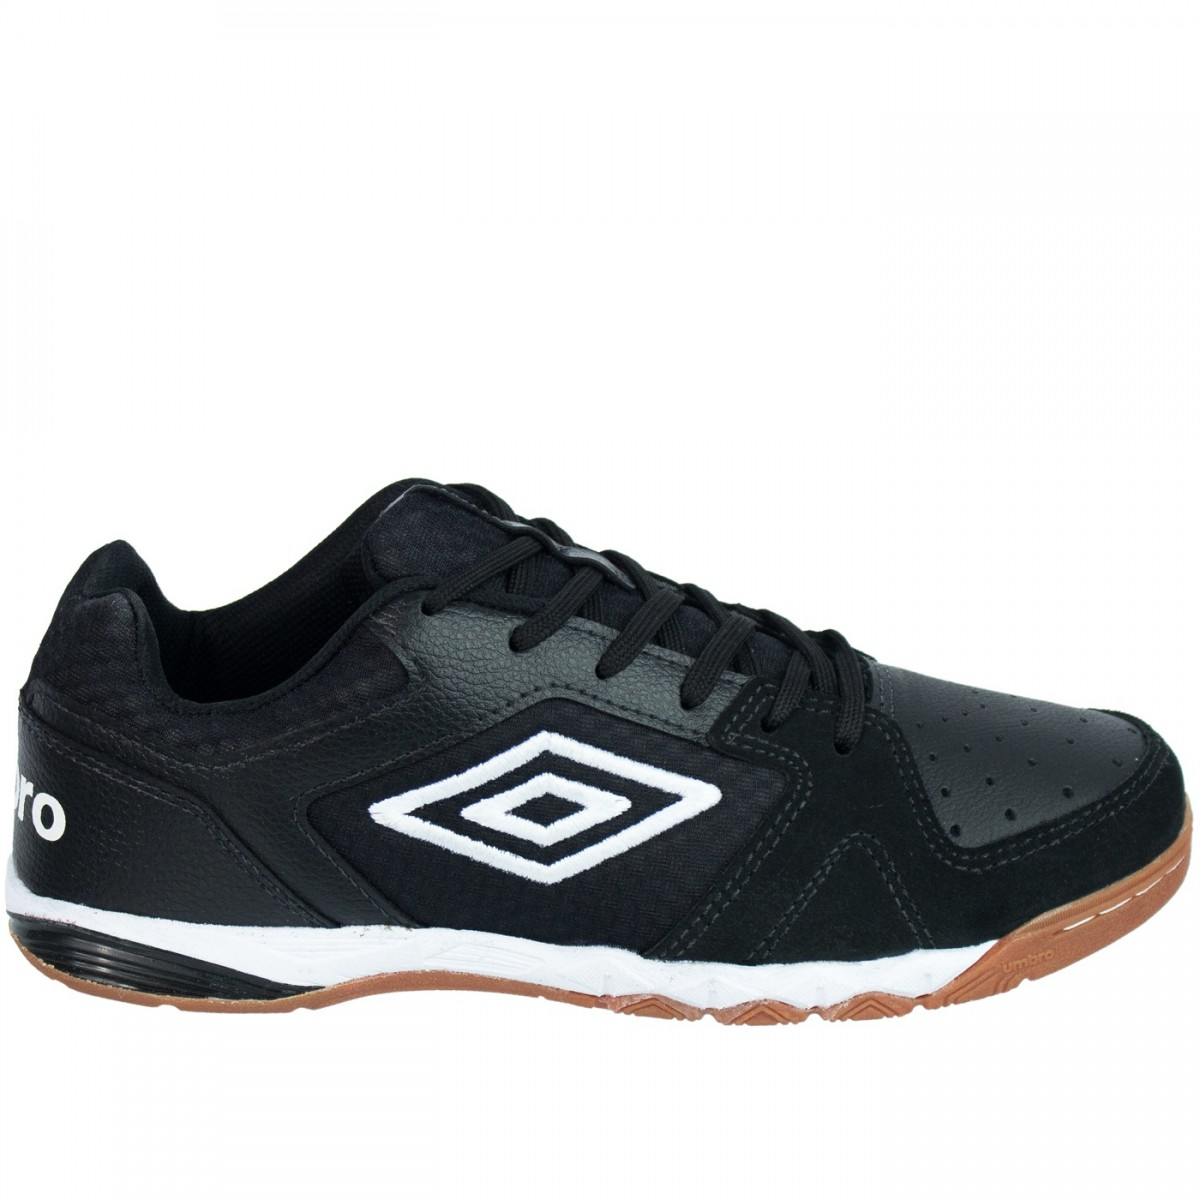 6f105a1e2964f Bizz Store - Tênis Futsal Umbro Indoor Pro III Couro Legítimo